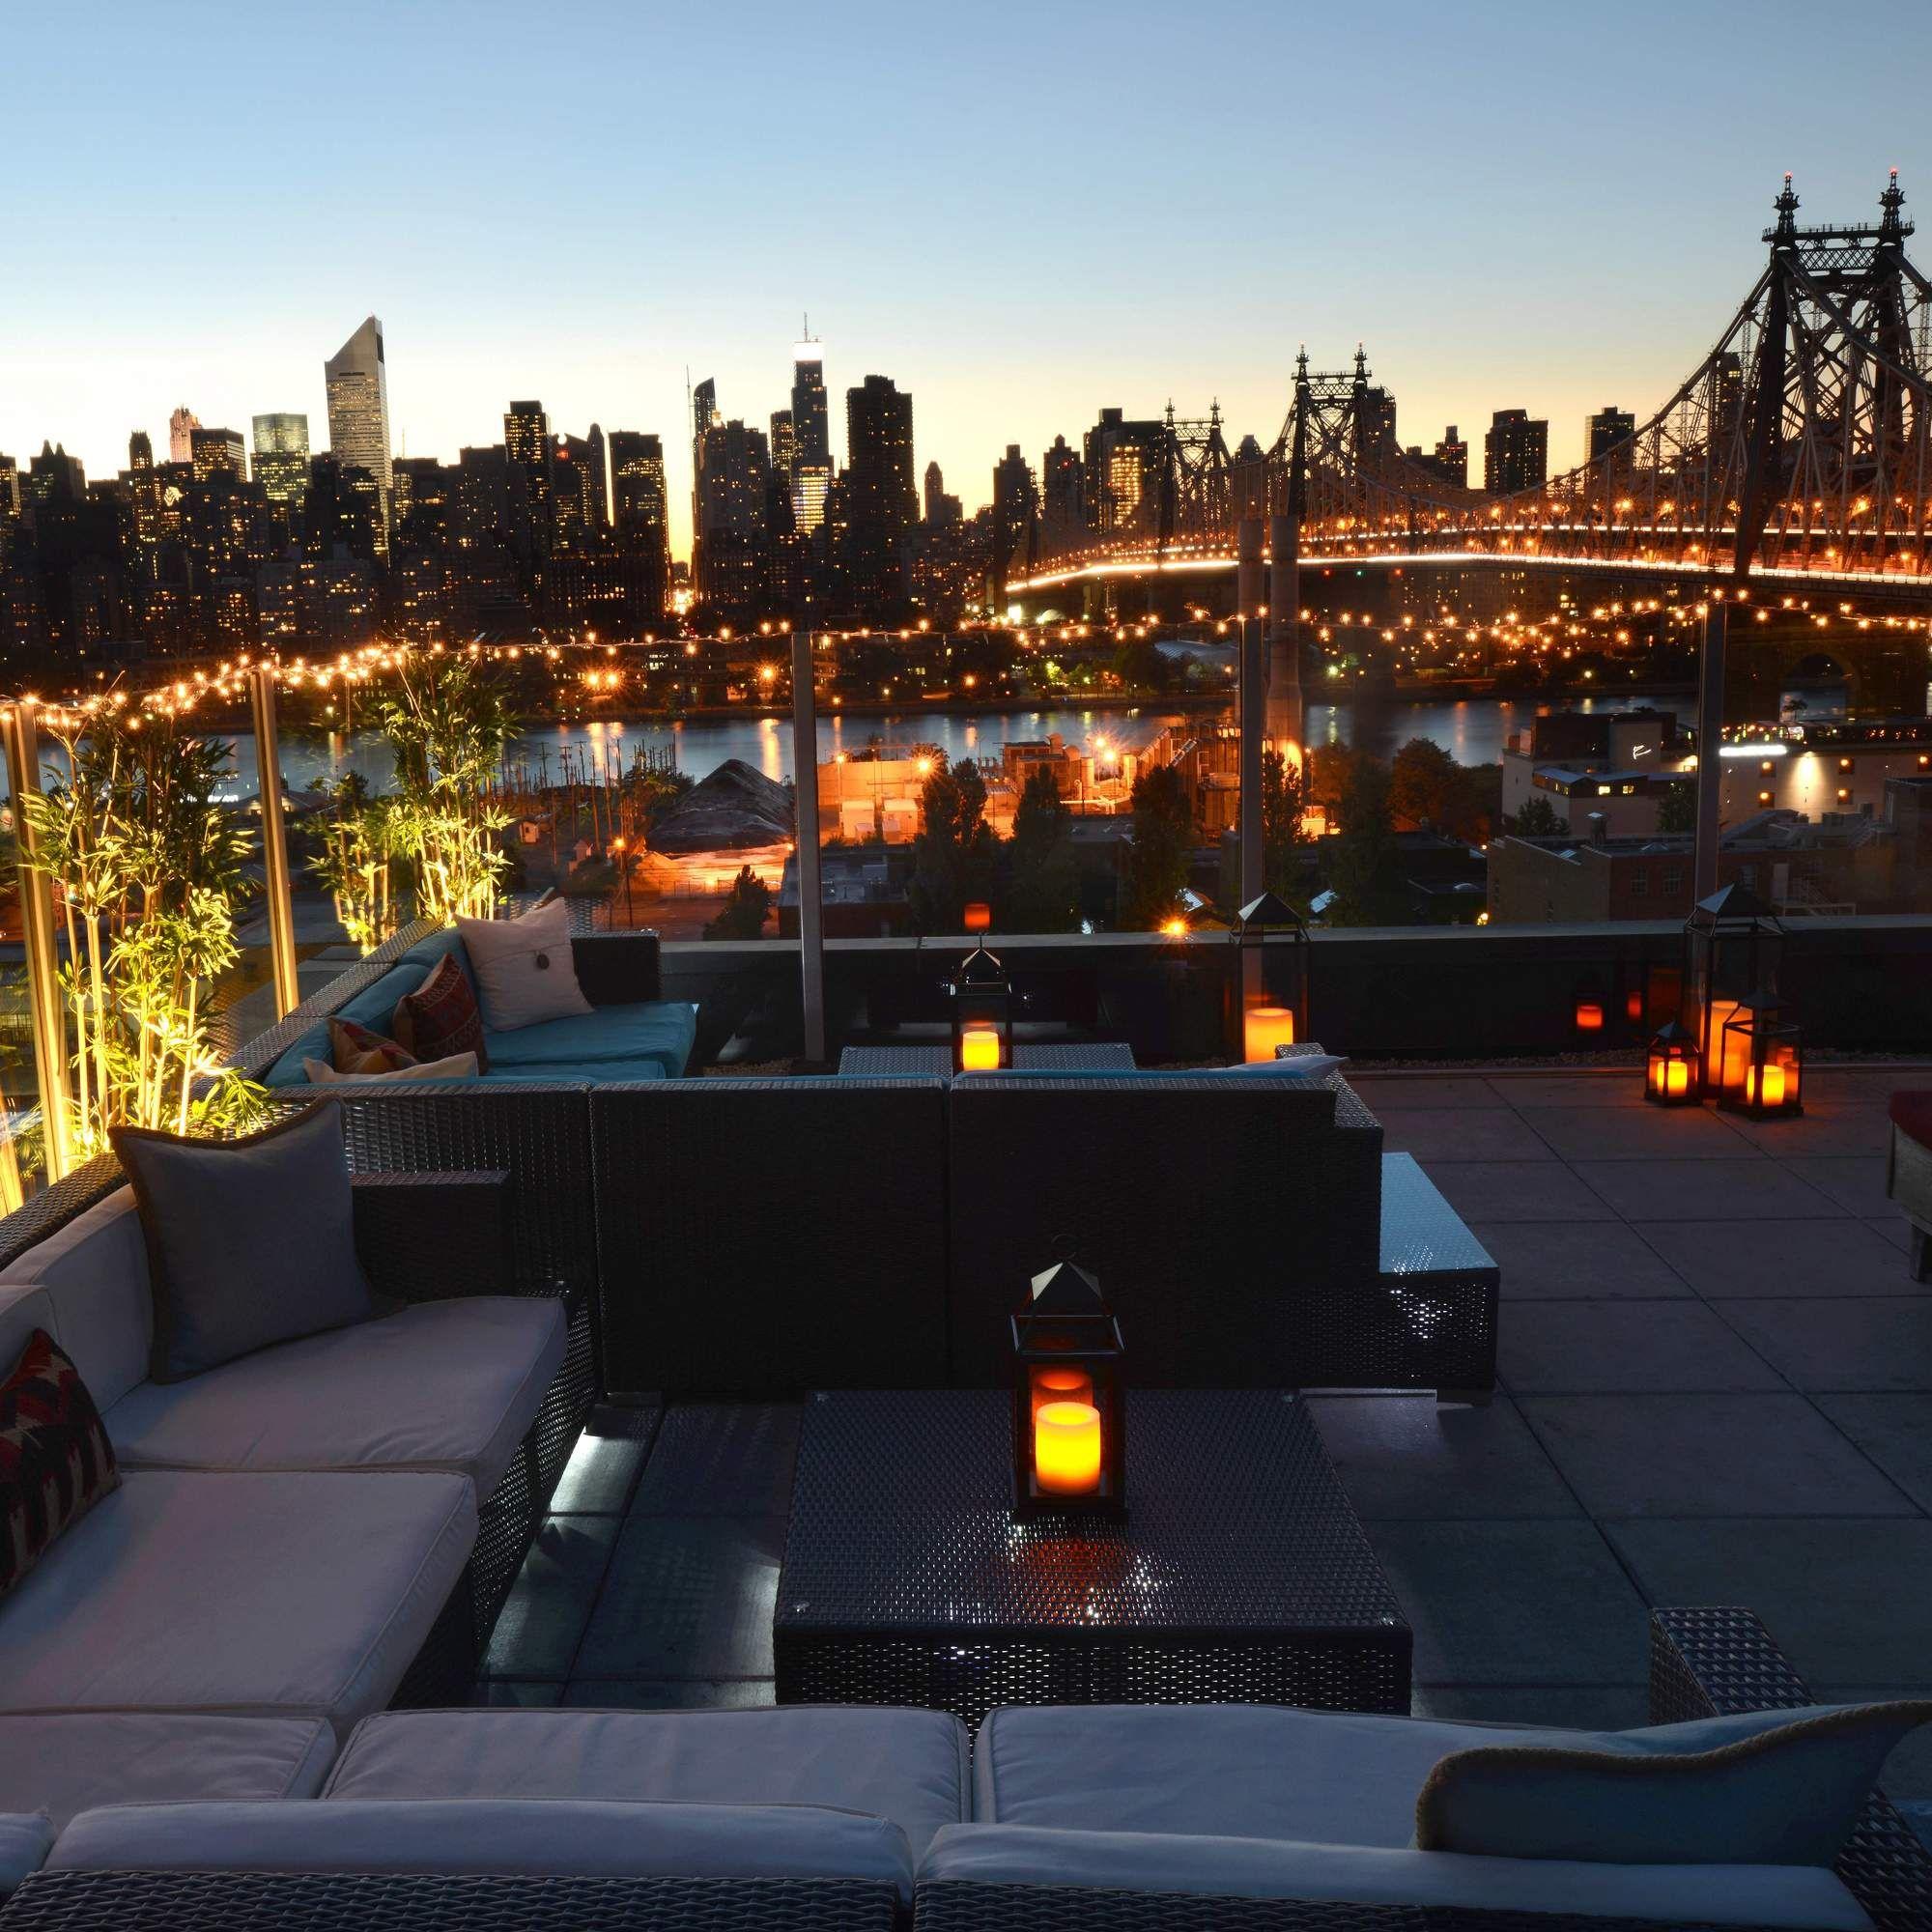 New York Rooftop & Top Floor Restaurant Dining Or Bar